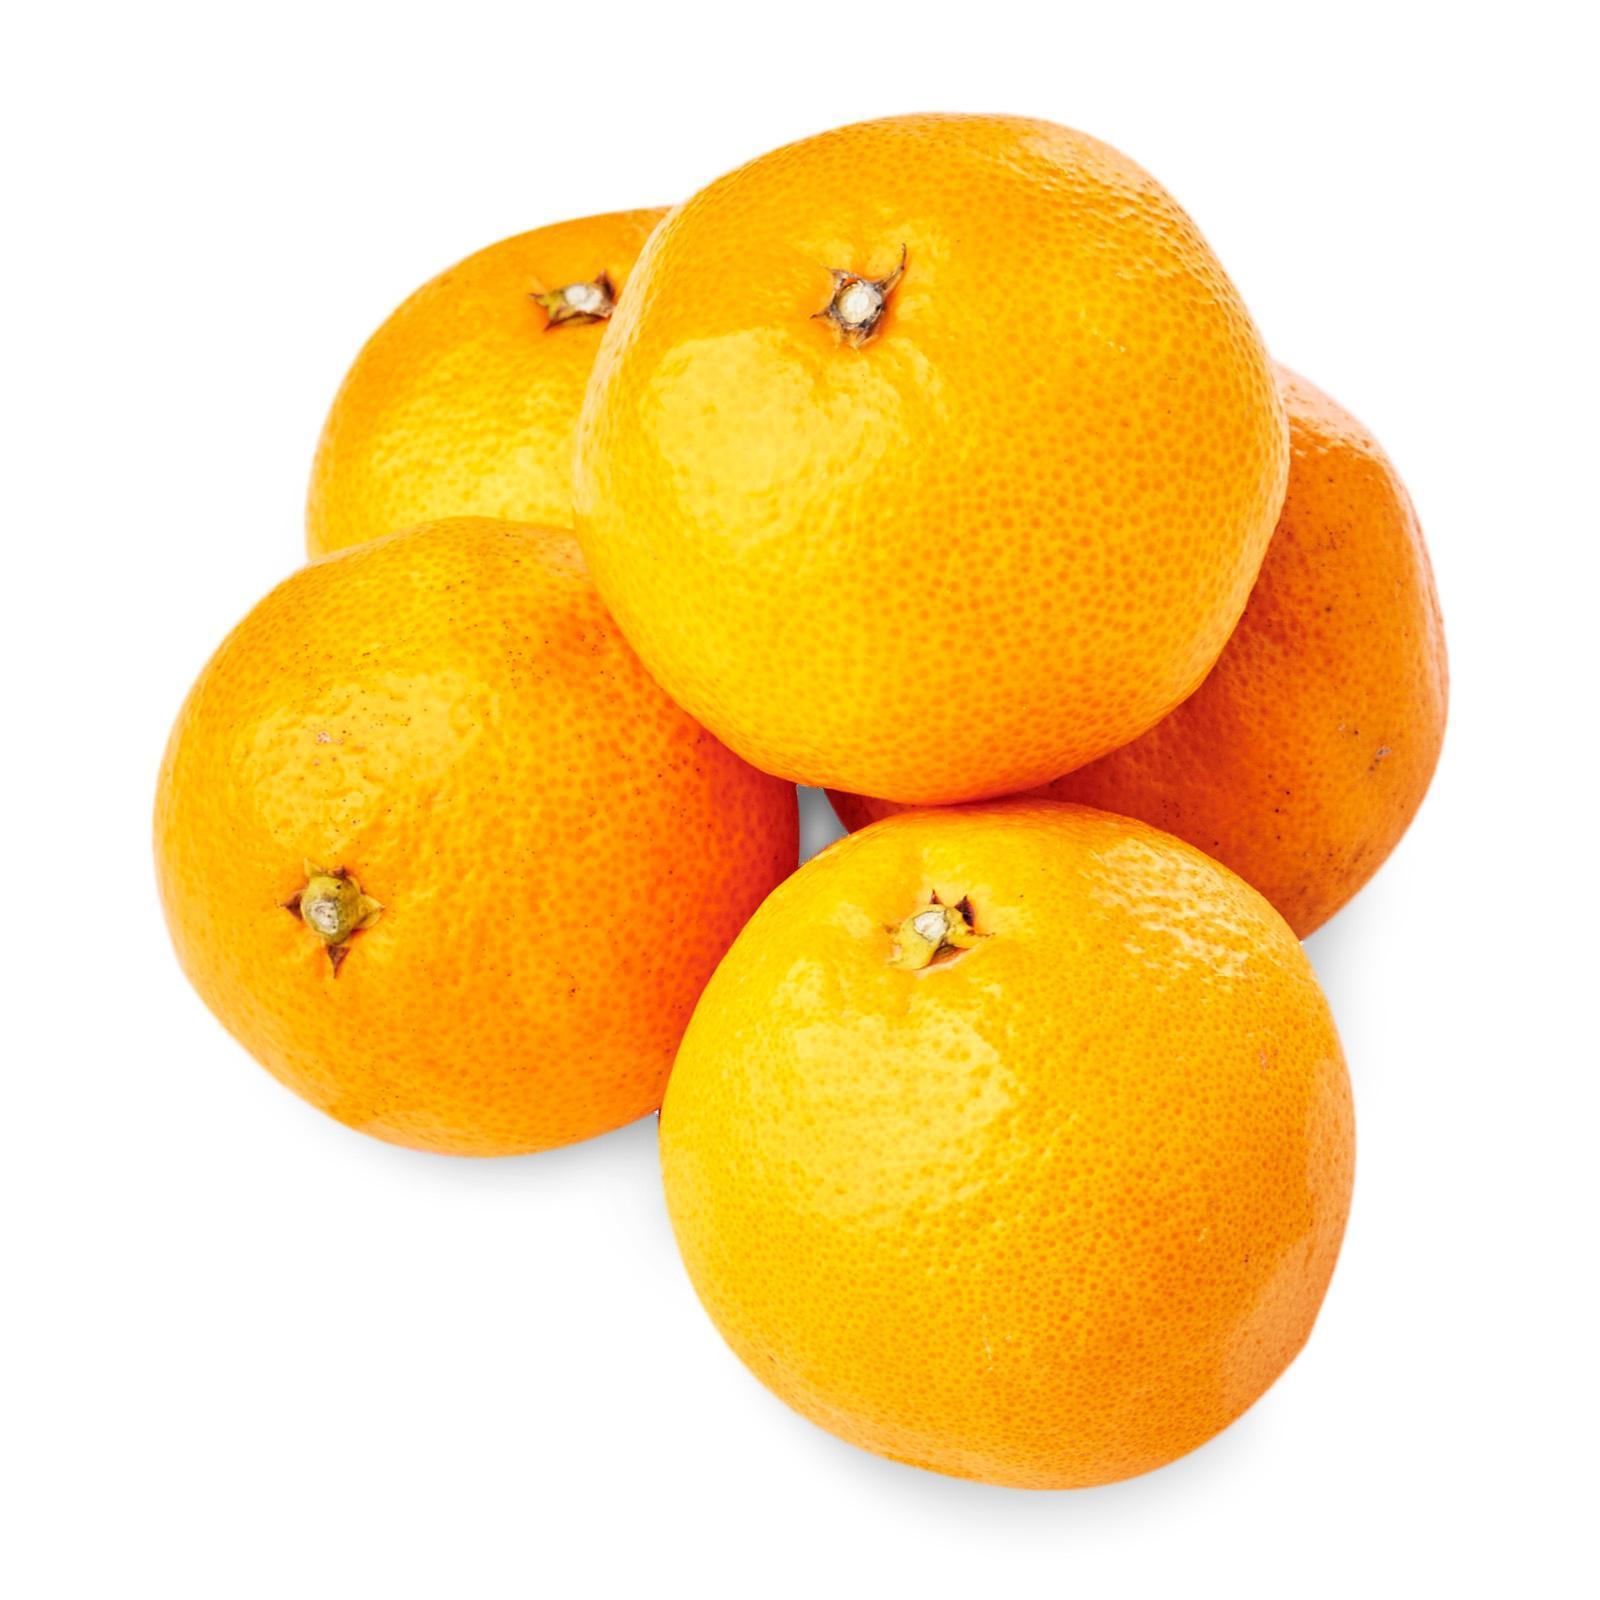 Kirei Premium Fruits - Japan Seedless Mikan Orange